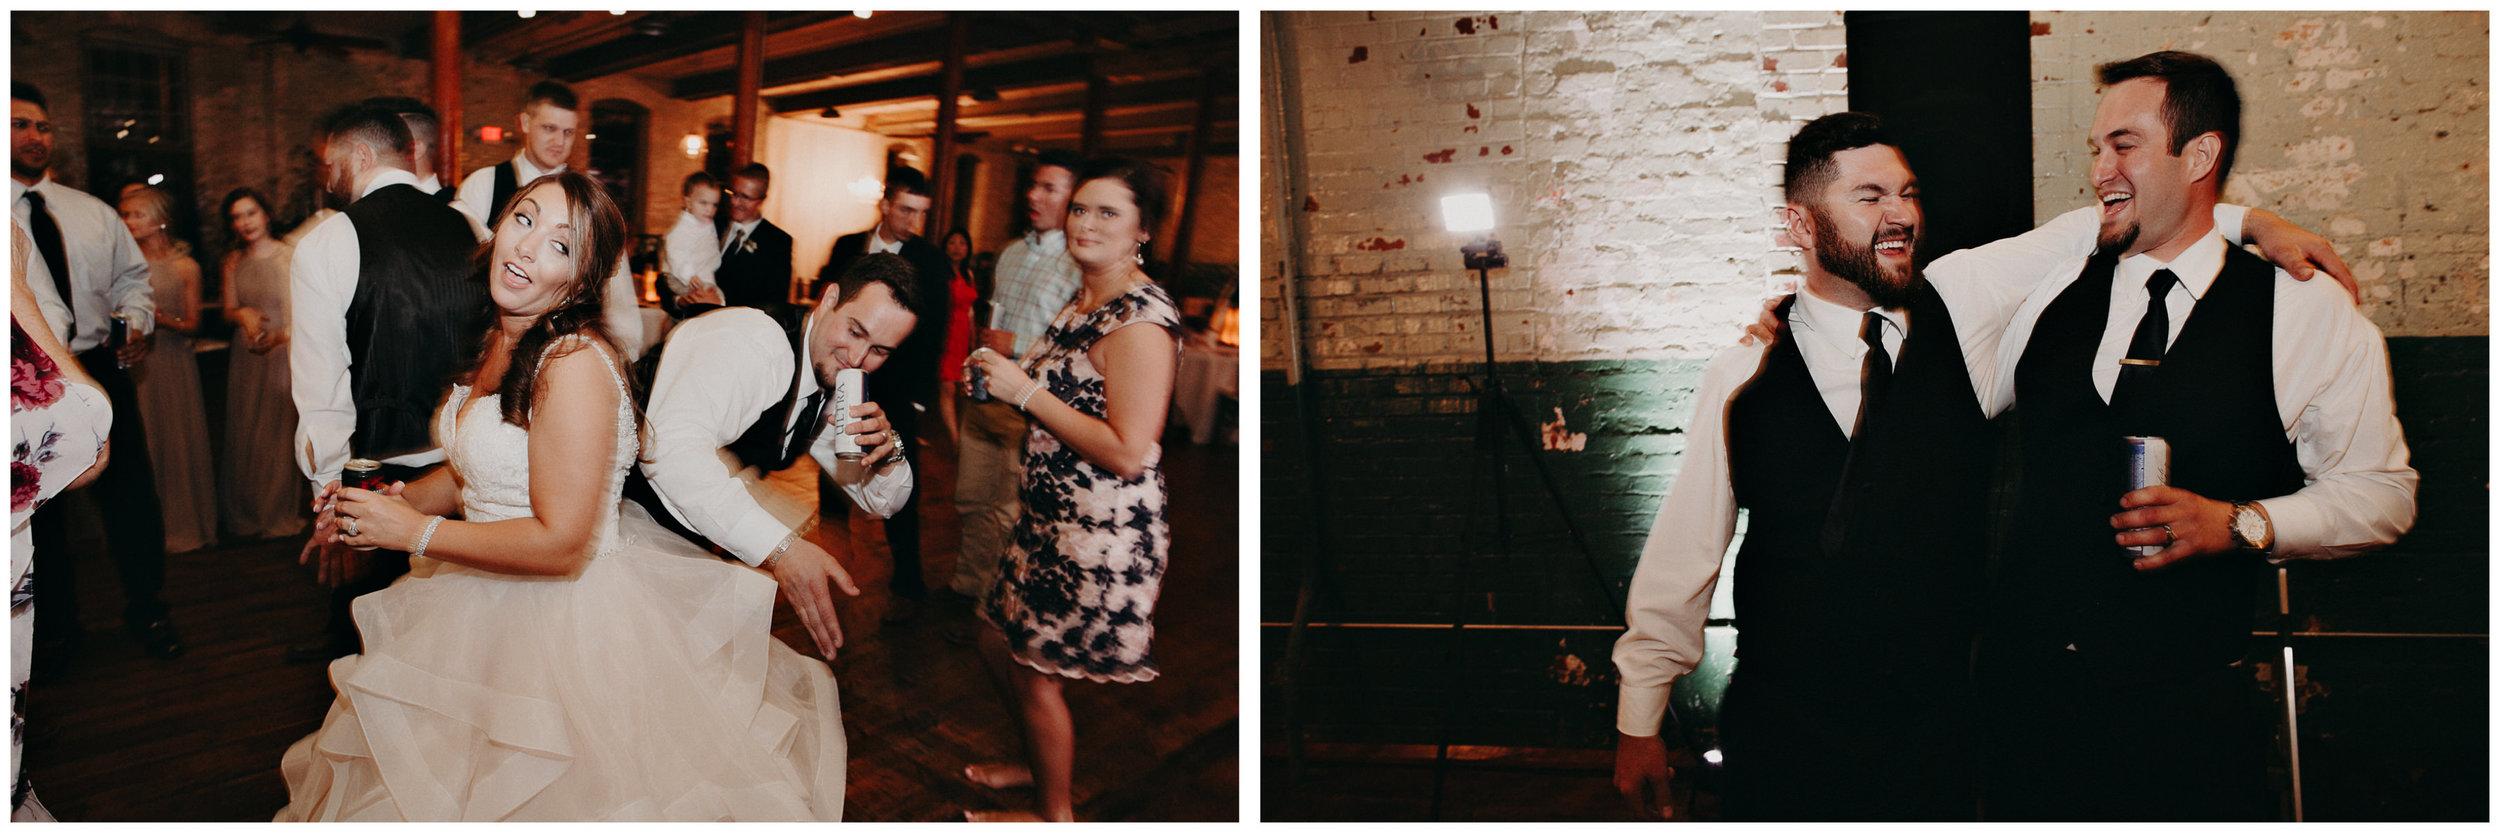 63 4 - Atlanta Wedding Photographer - The engine room - Ga - Wedding trends - Aline Marin Photography.jpg